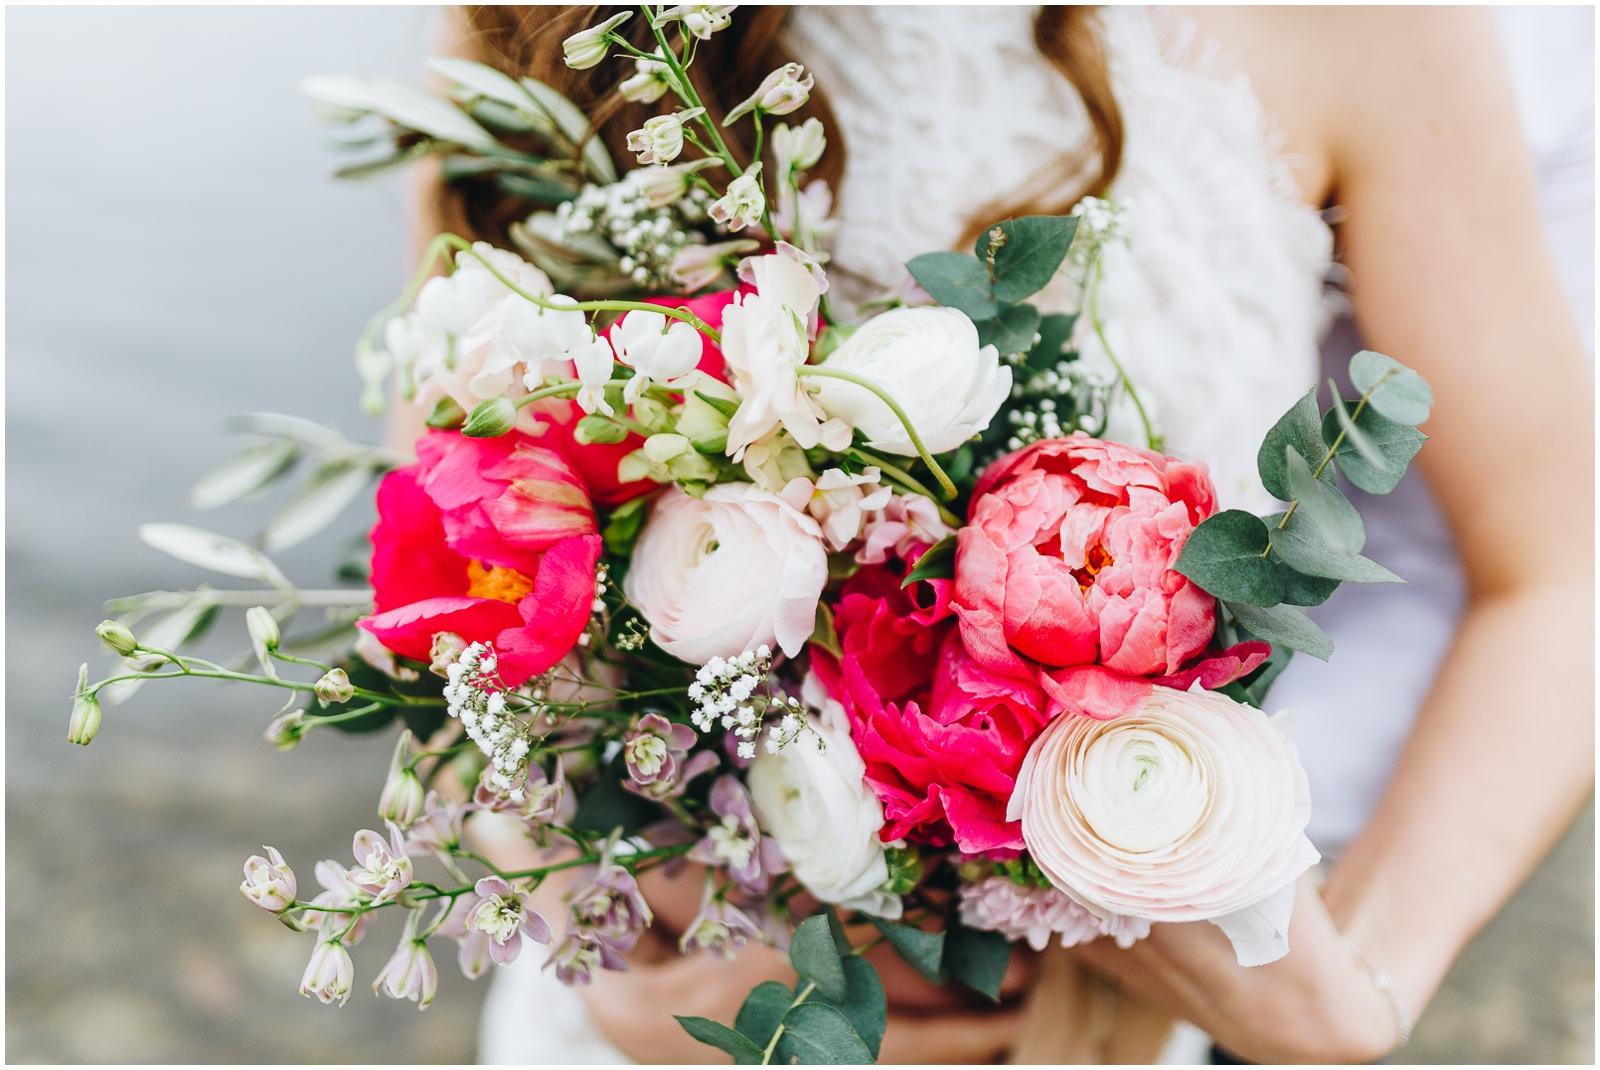 LE HAI LINH Photography-Hochzeitsfotograf-Bohohochzeit-_0004.jpg